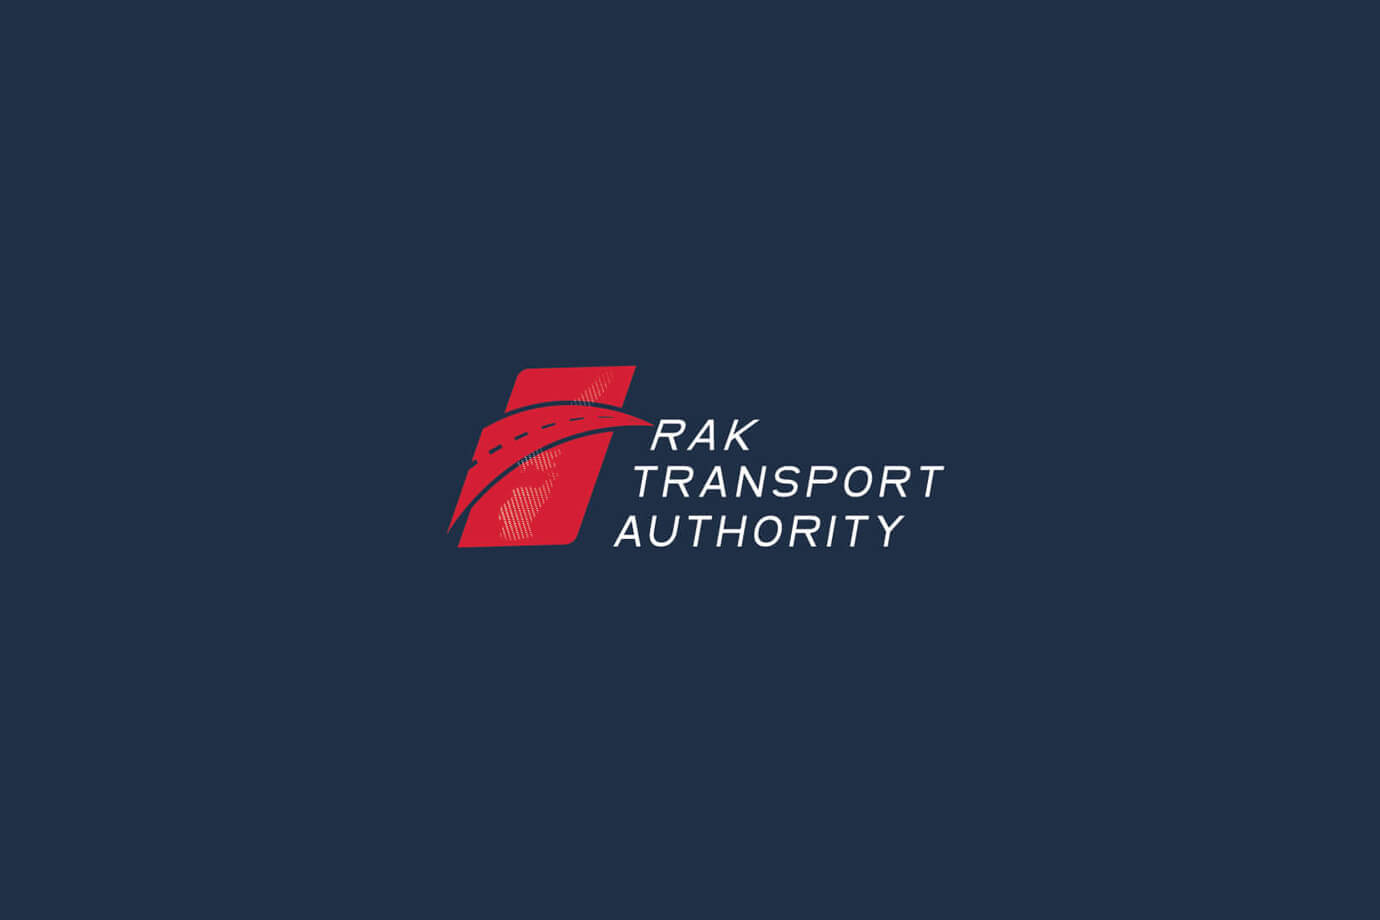 RAKTA Logo by SAJID SULAIMAN